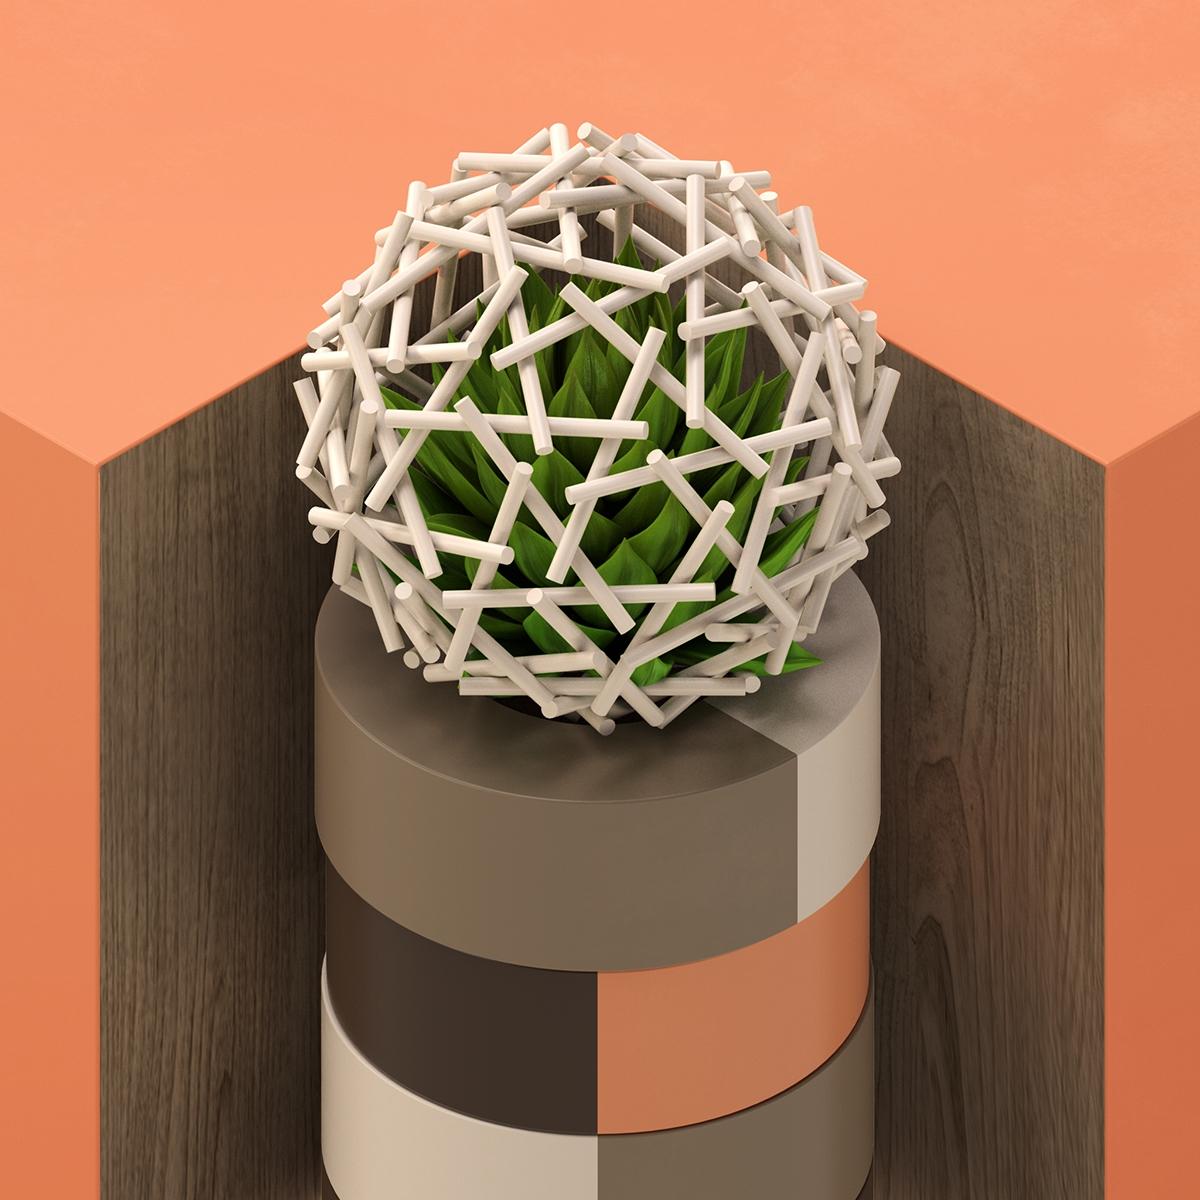 geometry - 3d, set, design, c4d - andreas_wannerstedt | ello